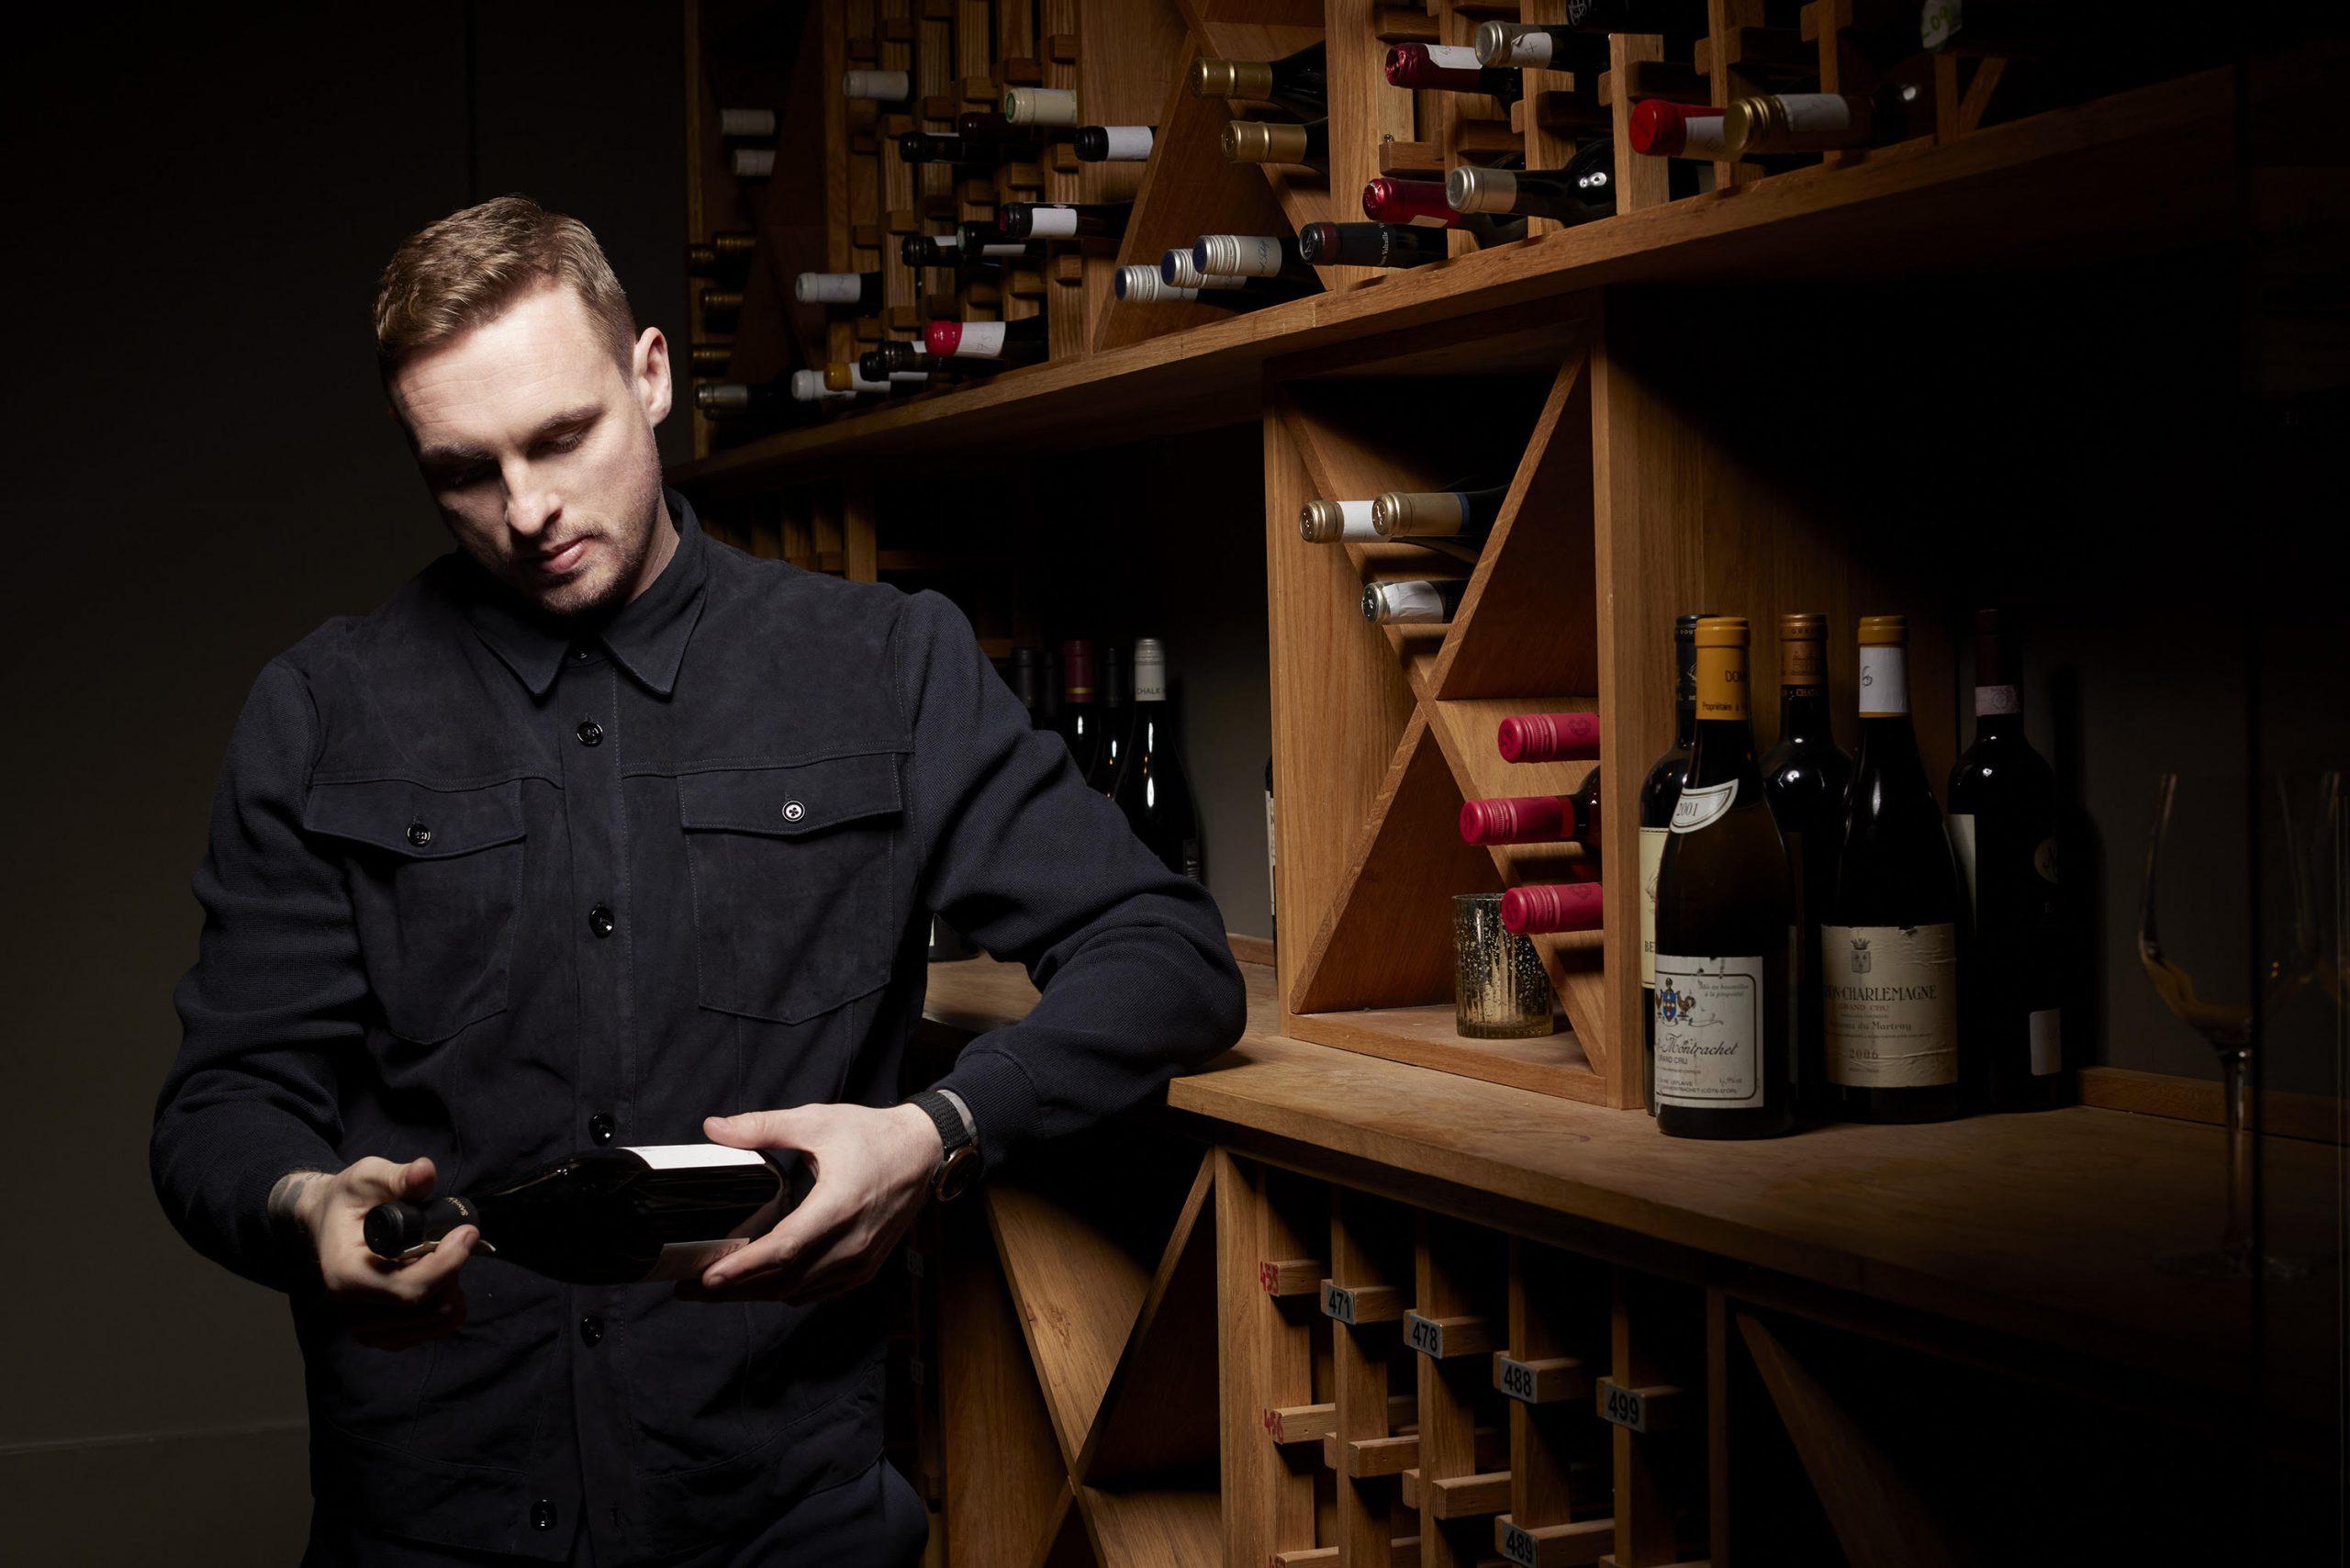 David Stockdale holding a bottle of wine in a wine cellar